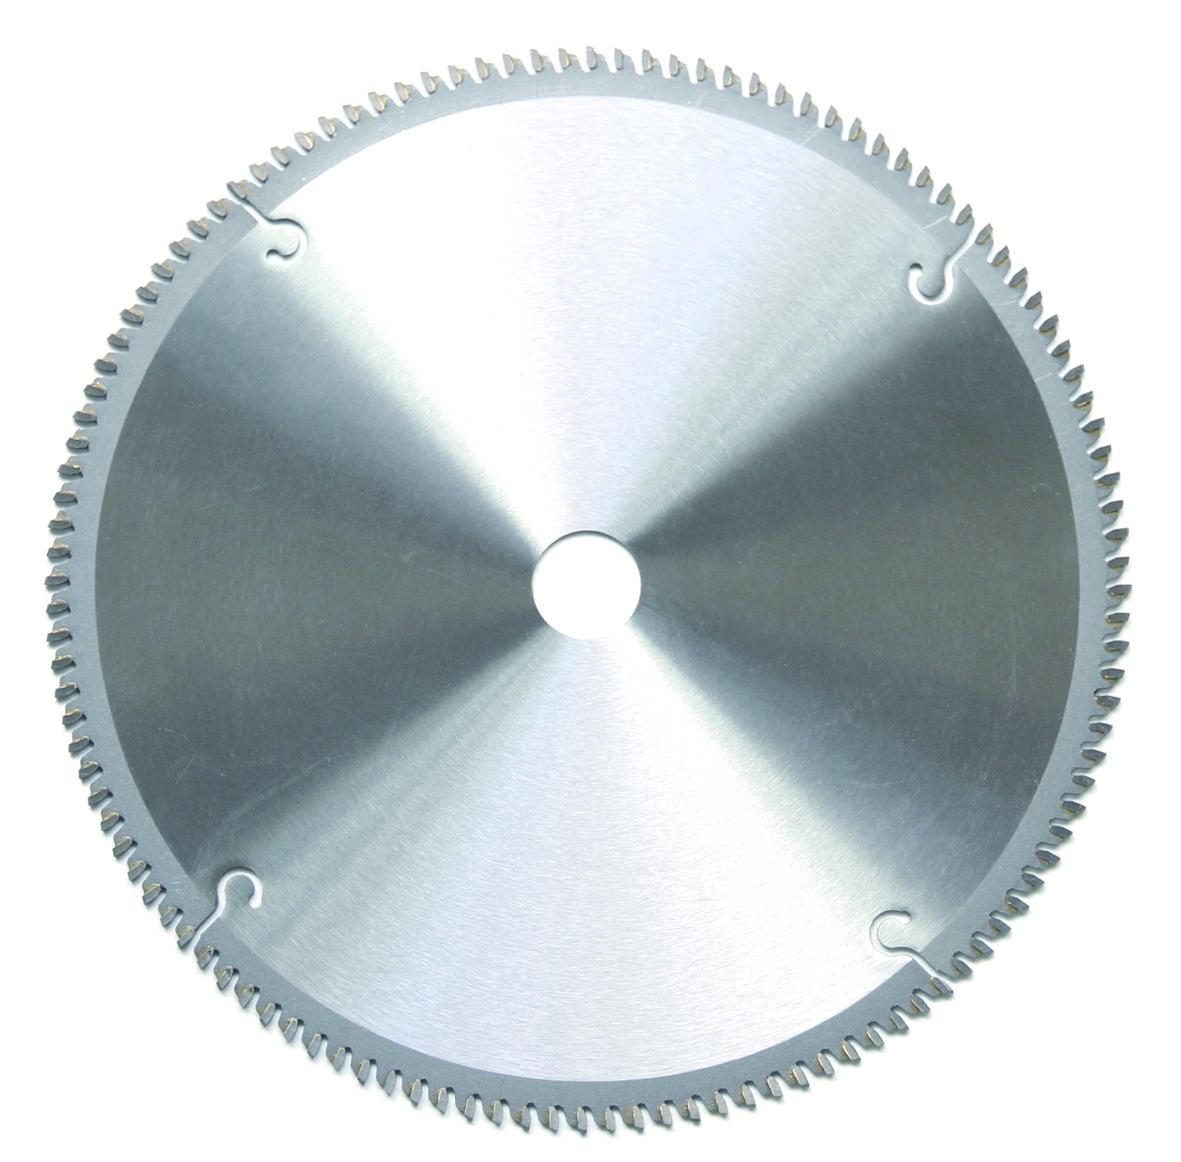 Best circular saw blade for cutting aluminum 2013 rav4 headlight replacement